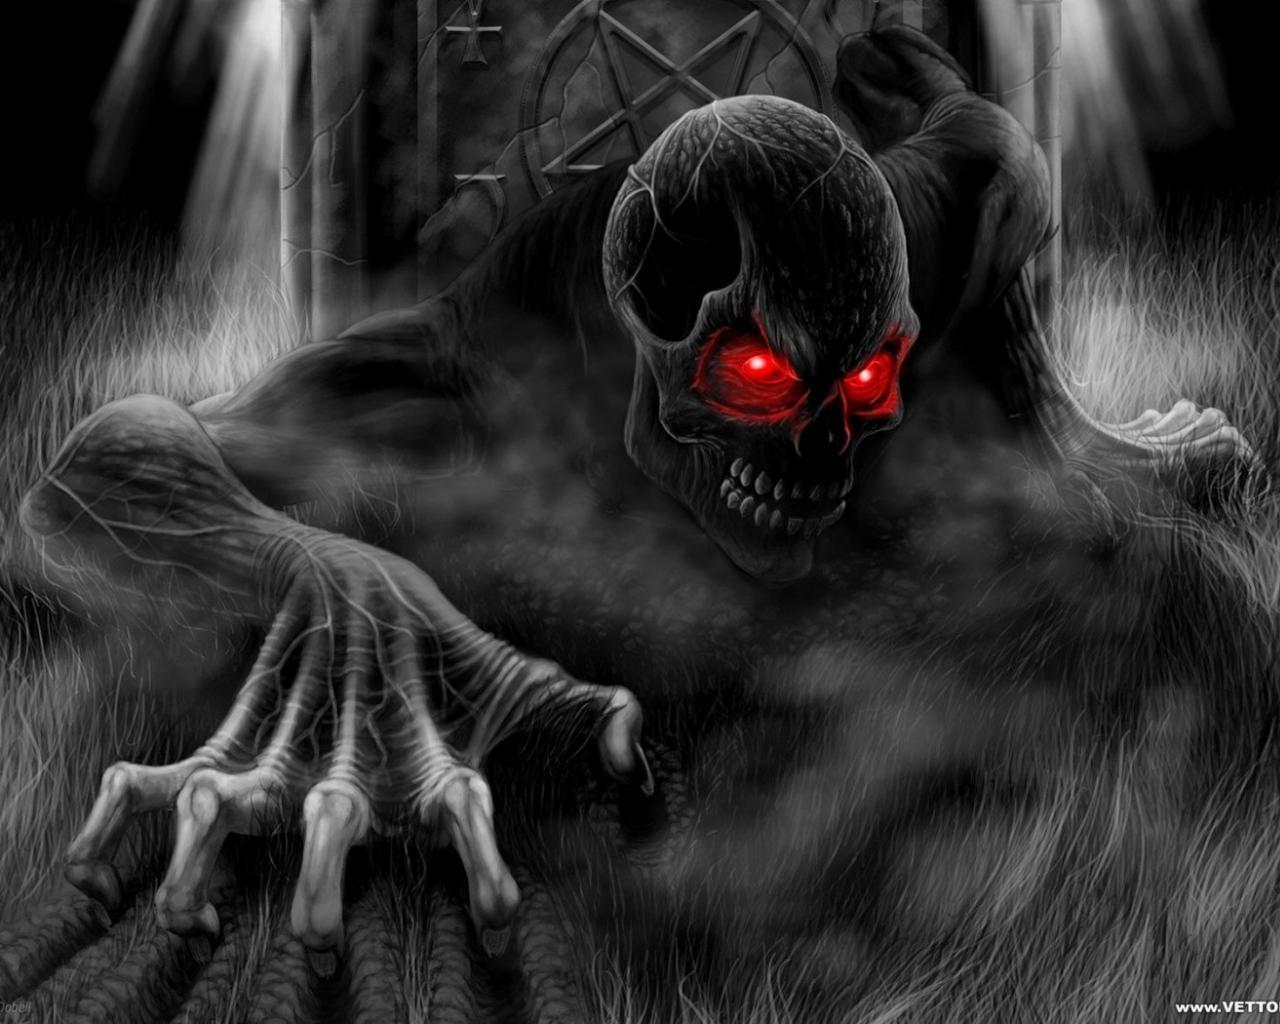 Horror creepy black death dark monsters gothic wallpaper 69249 1280x1024